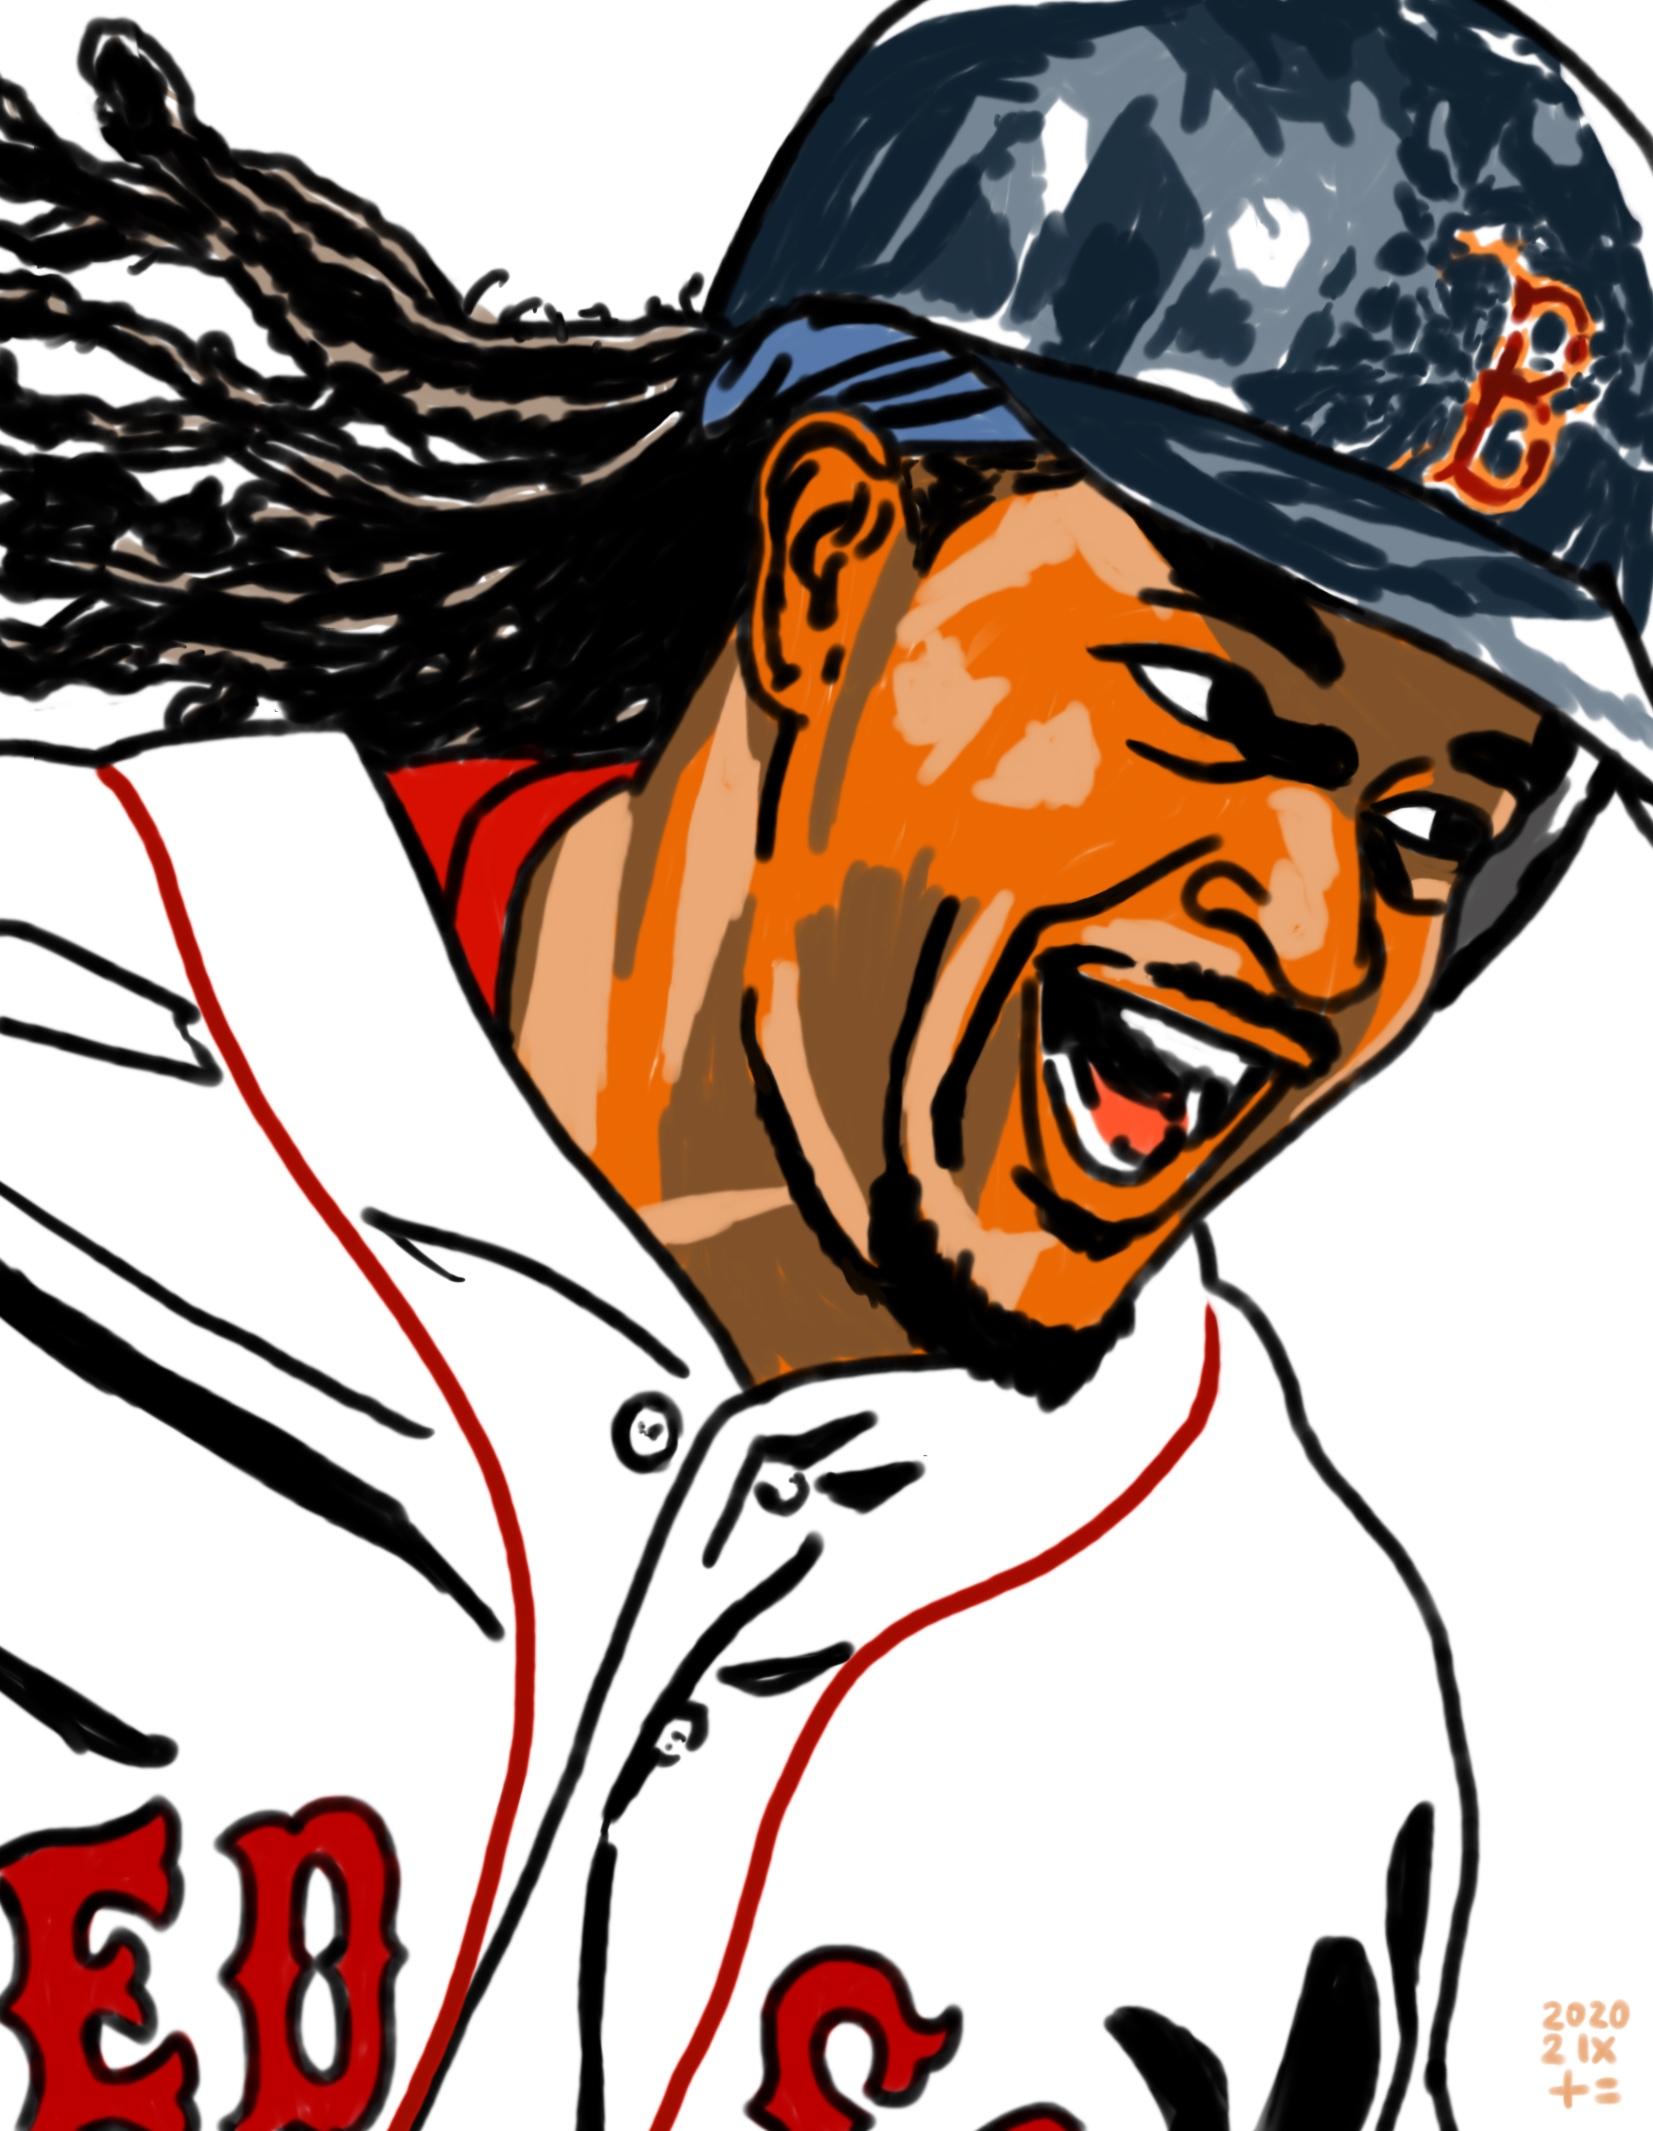 illustration of Boston Red Sox Manny Ramirez's smile